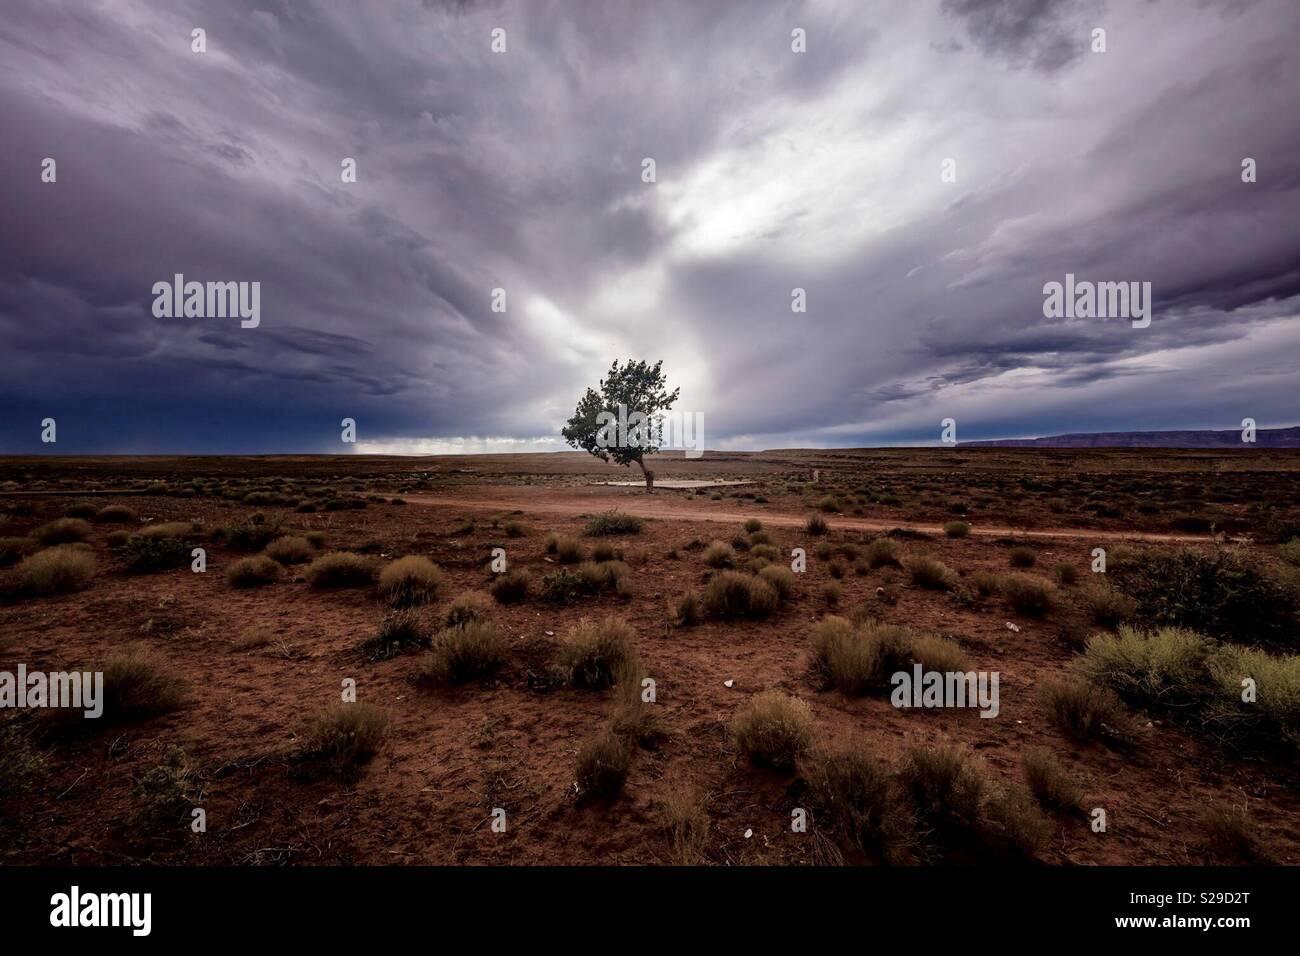 Arbre du désert Photo Stock